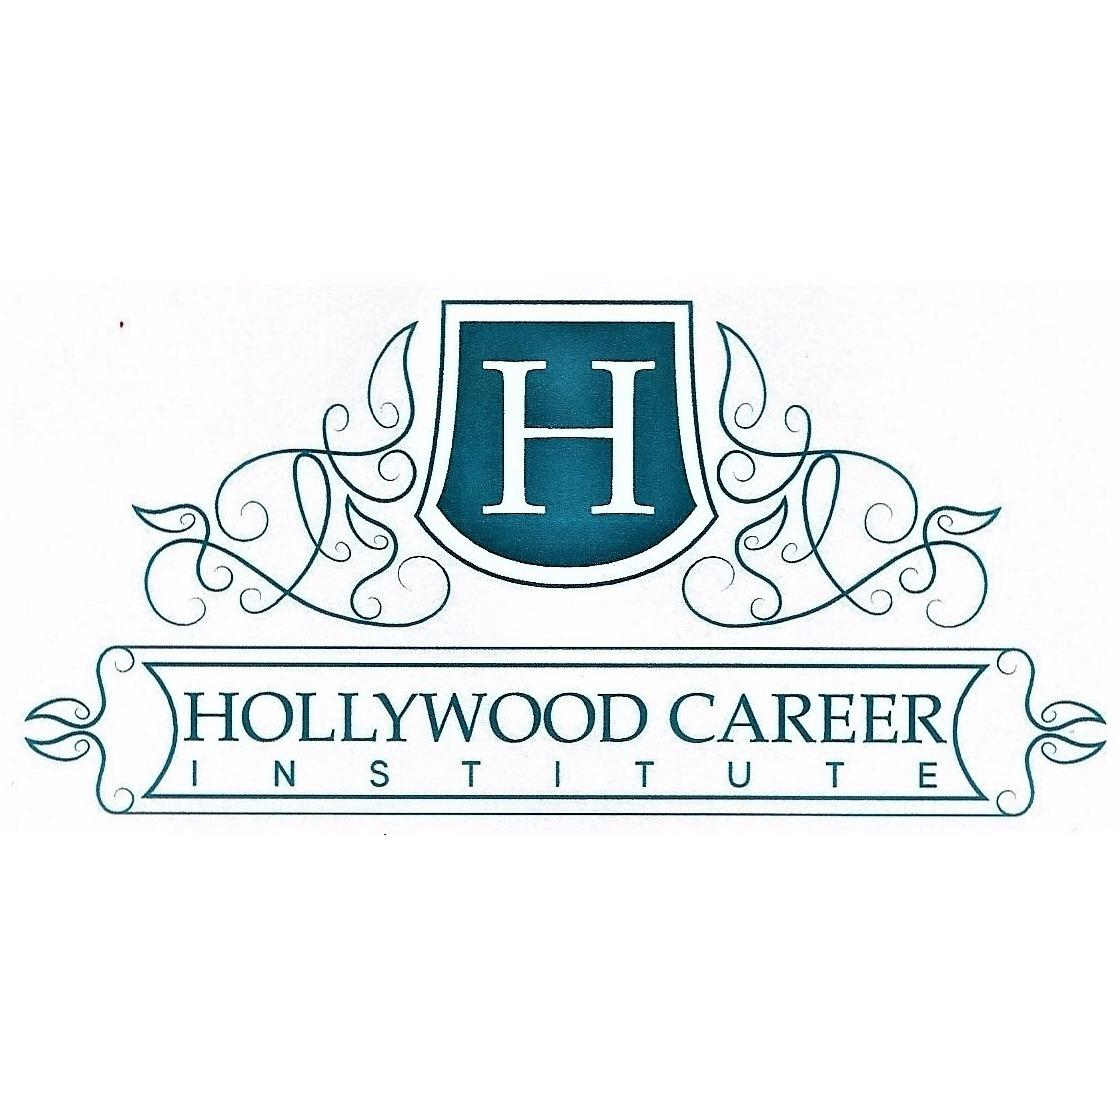 Hollywood Career Institute, LLC